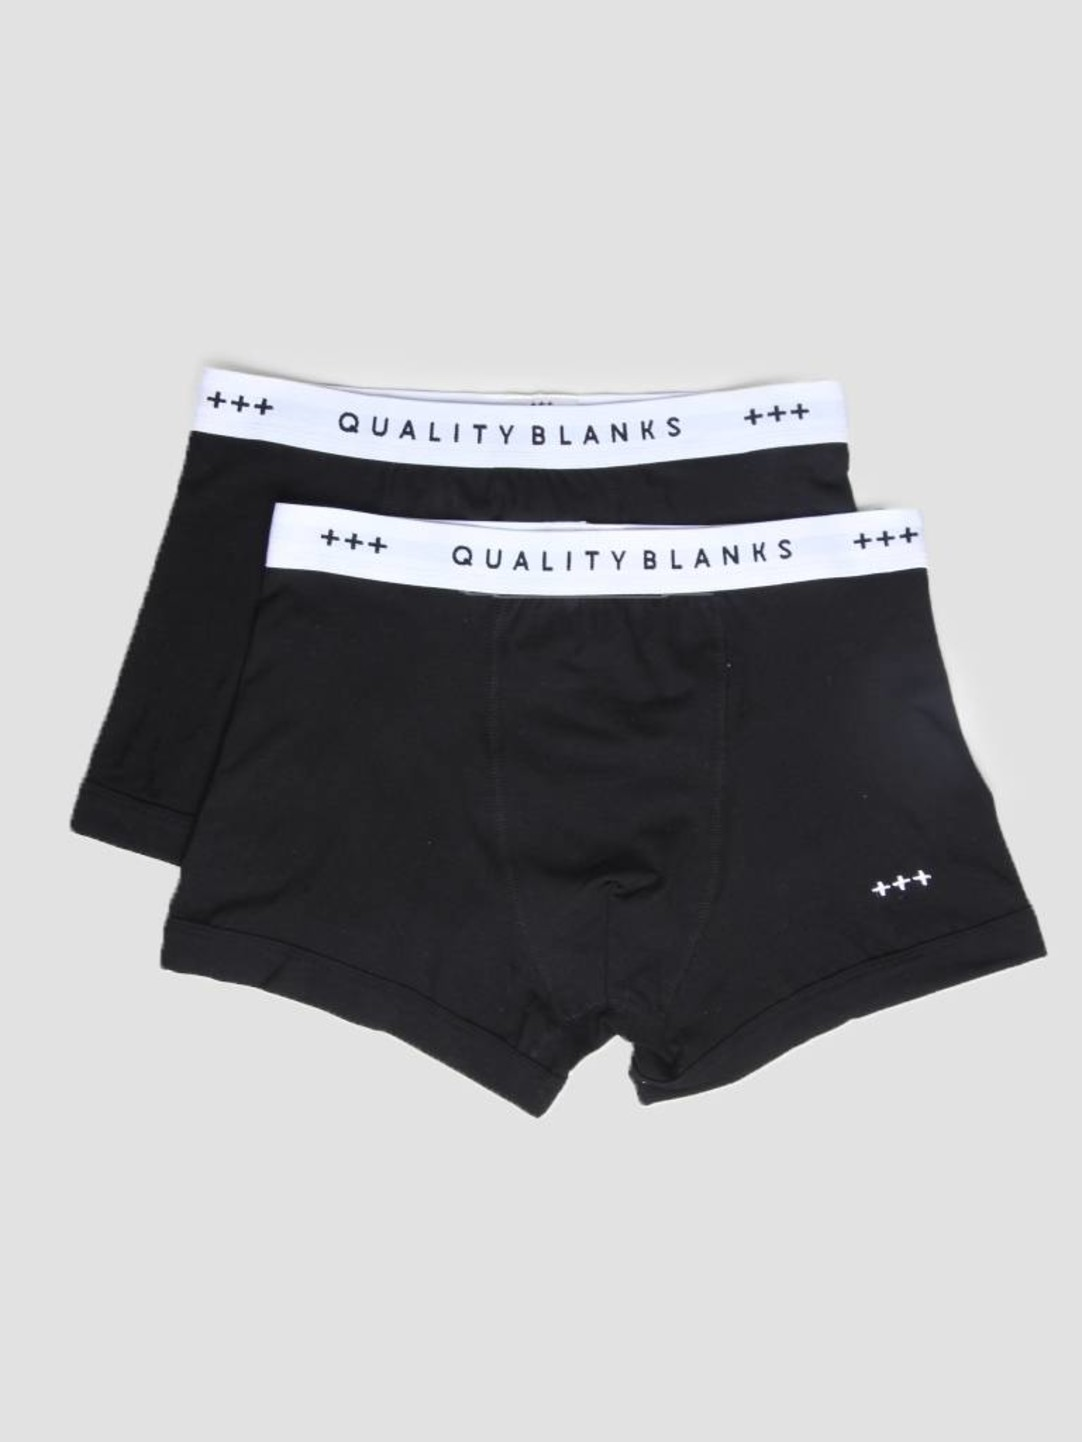 Quality Blanks Quality Blanks QB04 2-pack Trunks Black Black